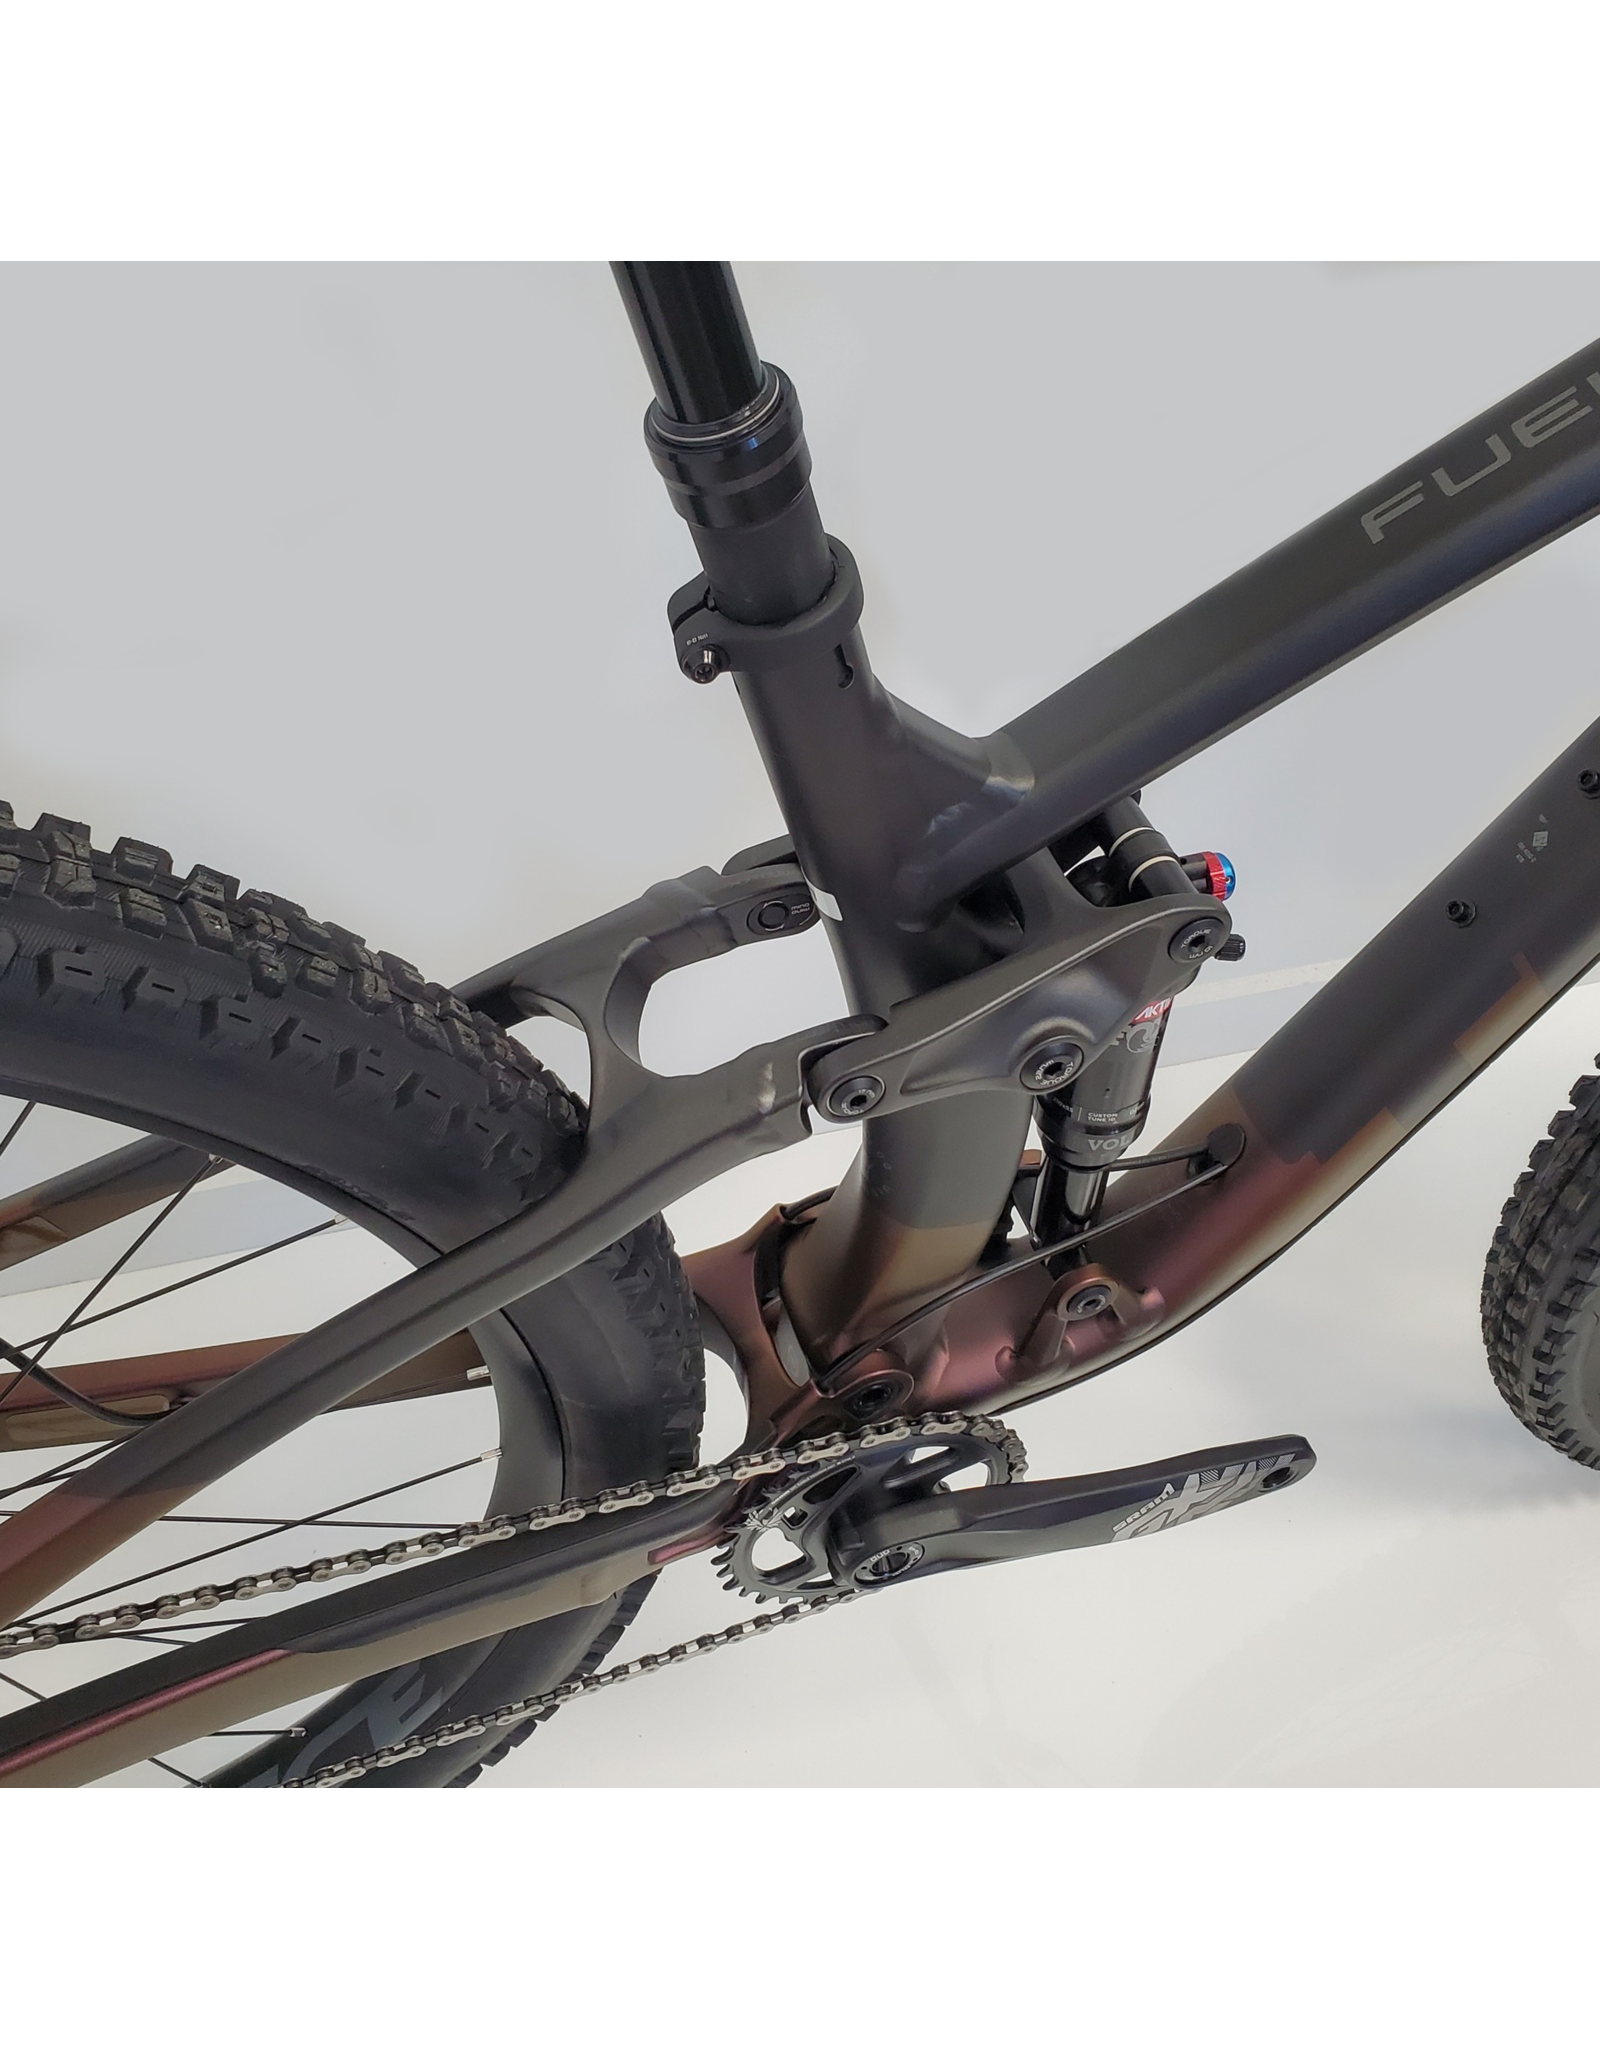 TREK 2020 Trek Fuel EX 29 Alu - Montage maison - Xlarge